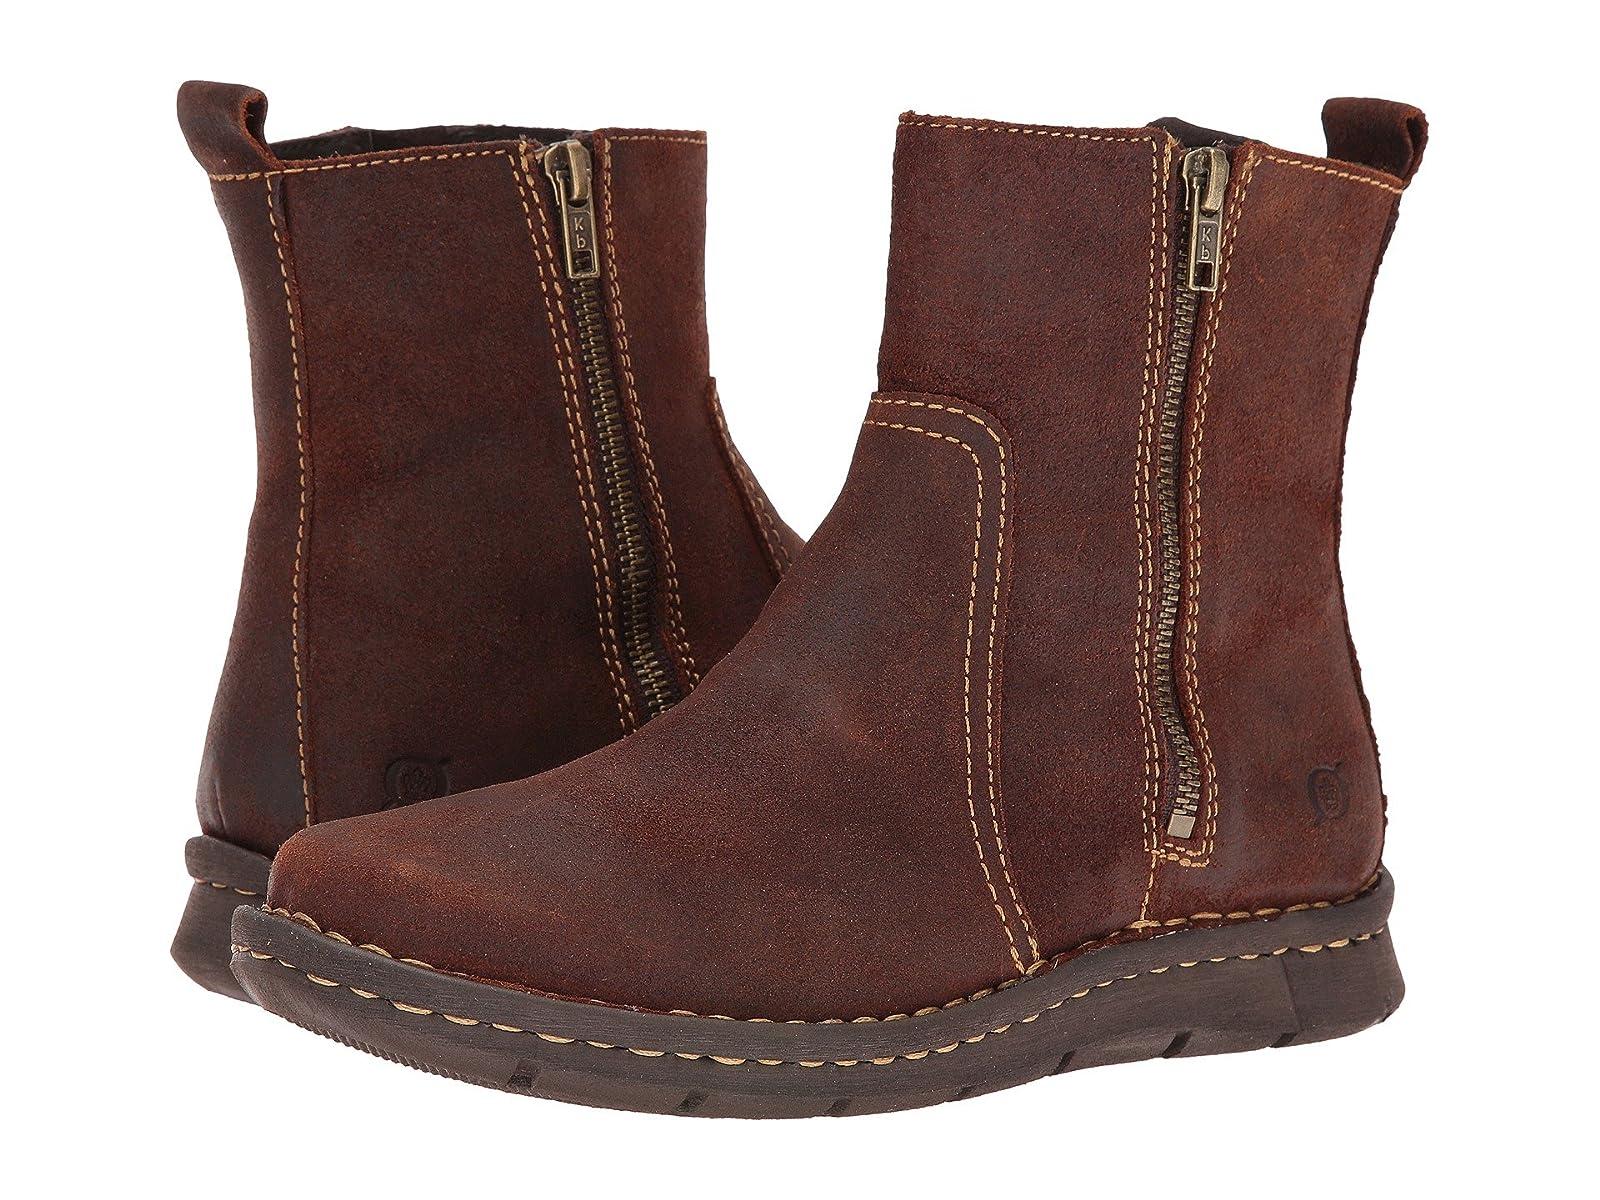 Born RiskoSelling fashionable and eye-catching shoes